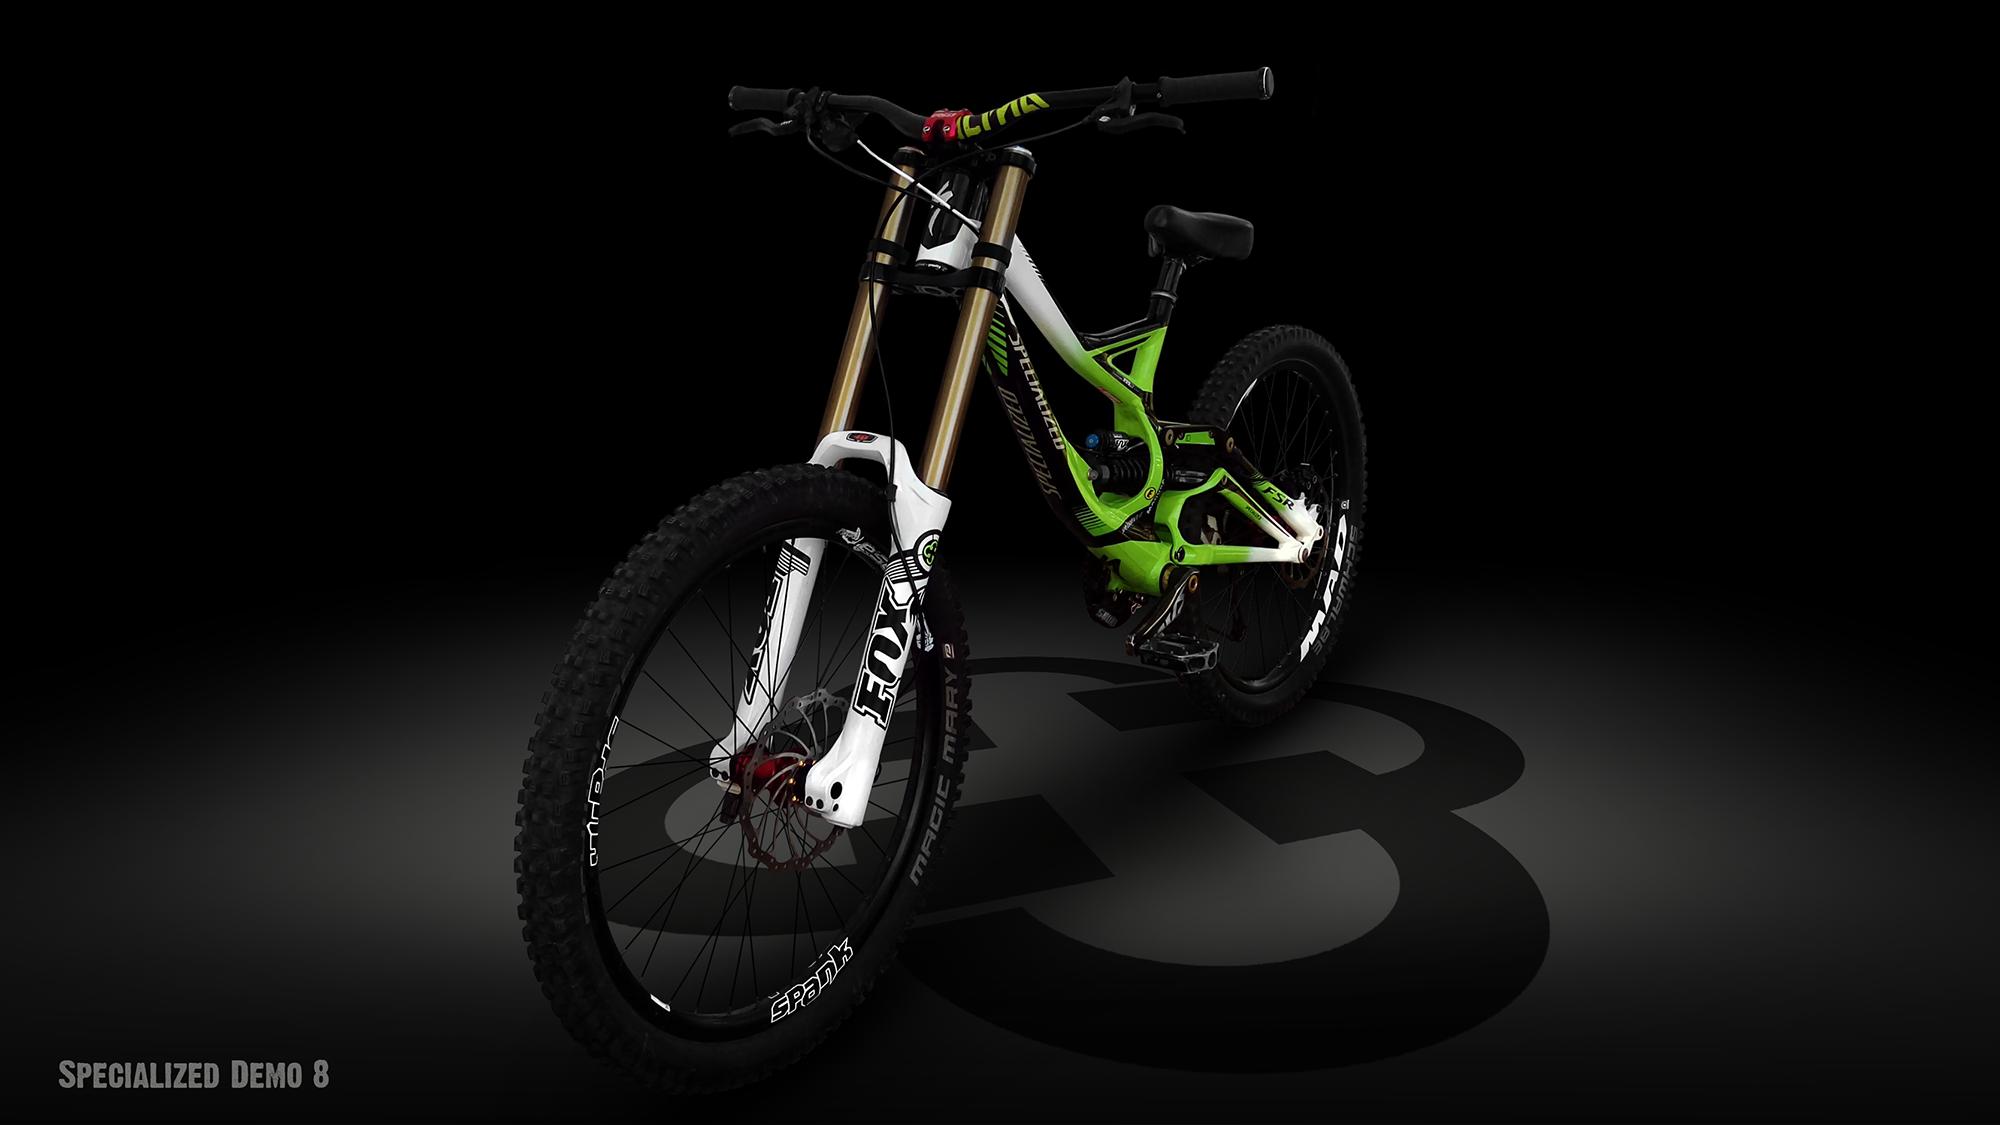 Wallpaper Specialized Demo Downhill Mountain Biking Bicycle Mountain Bikes 2000x1125 Xero35 1224716 Hd Wallpapers Wallhere